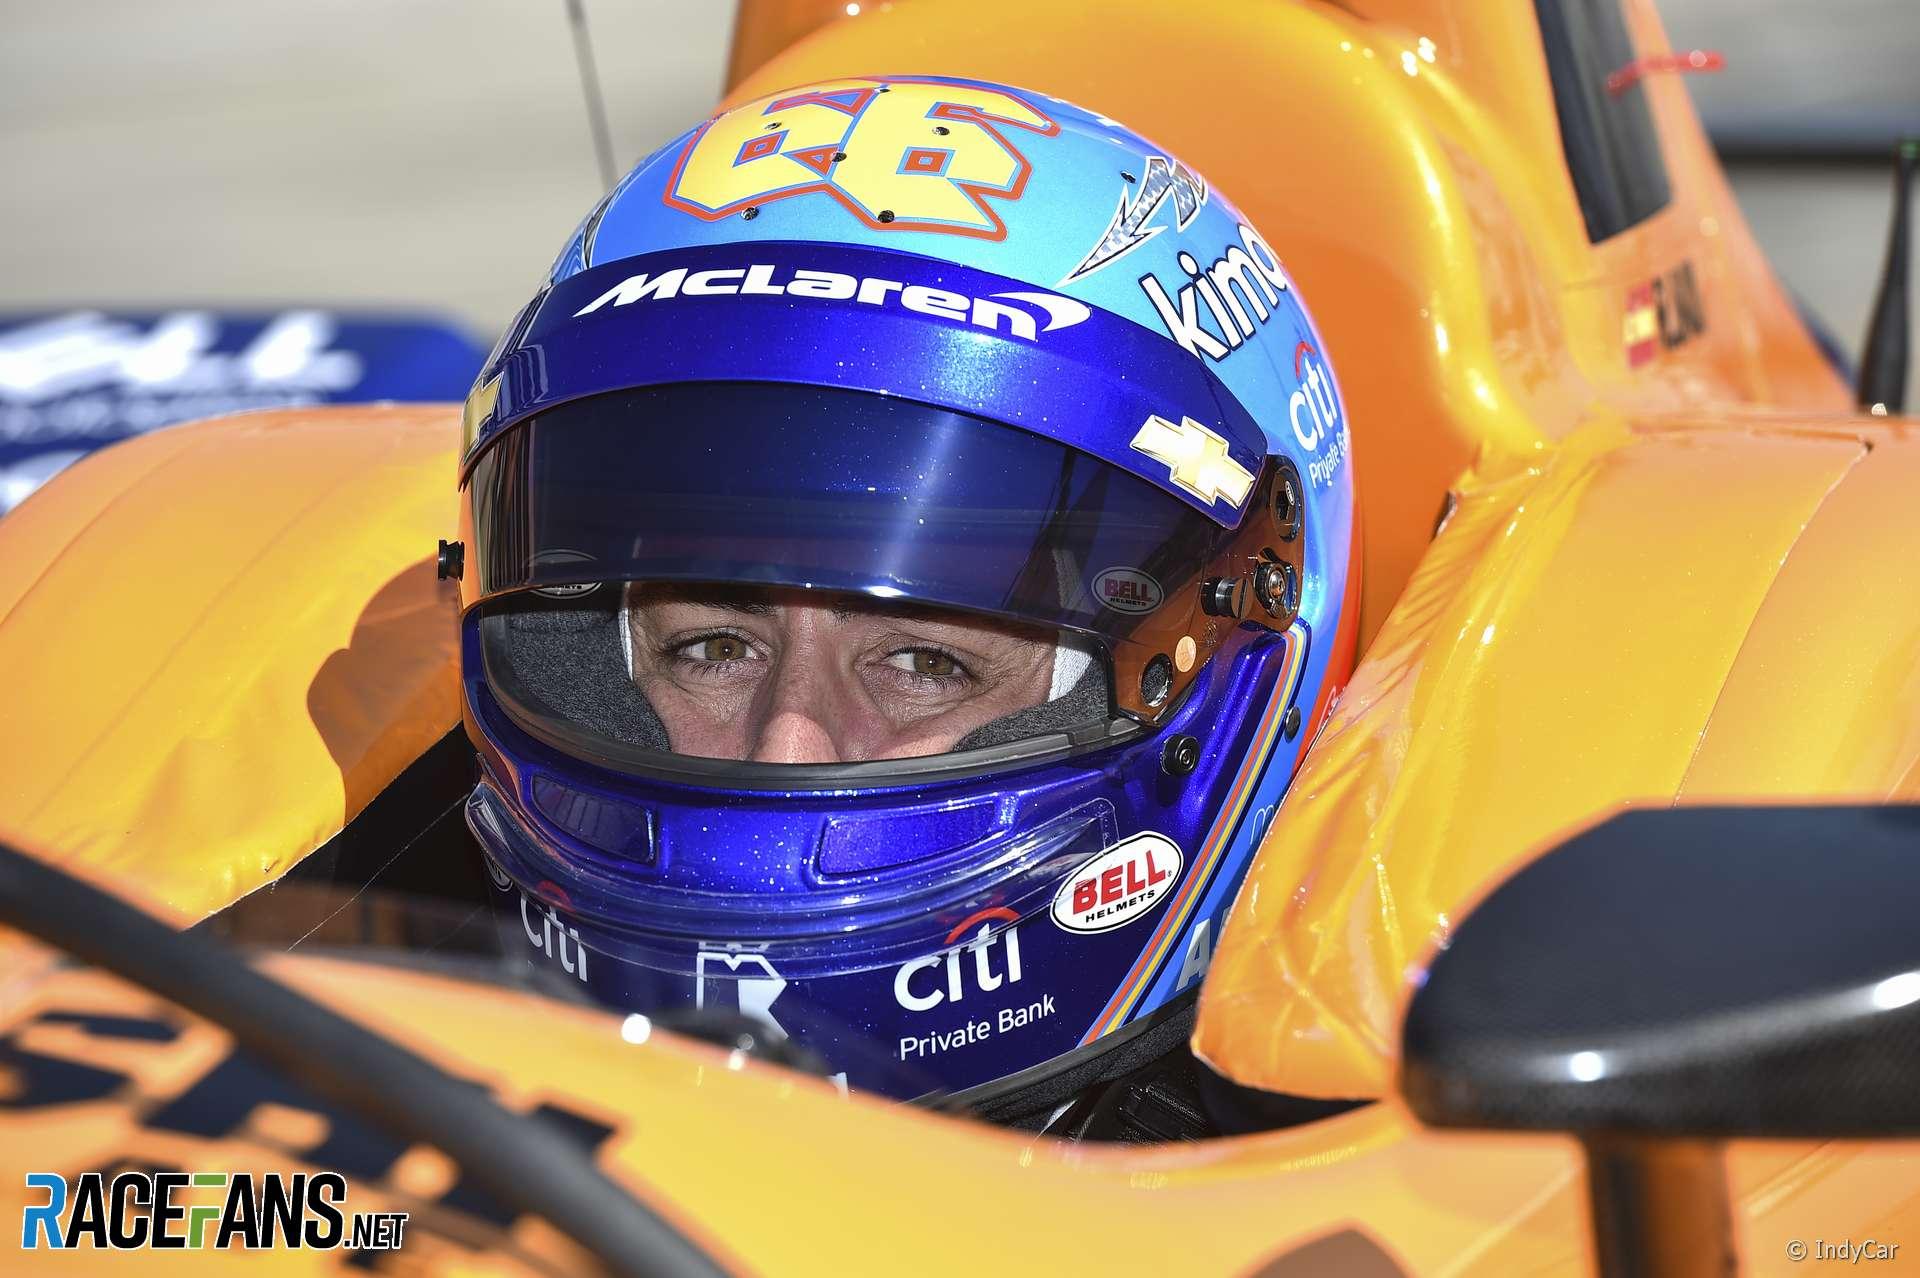 Fernando Alonso, McLaren, IndyCar, Texas Motor Speedway, 2019